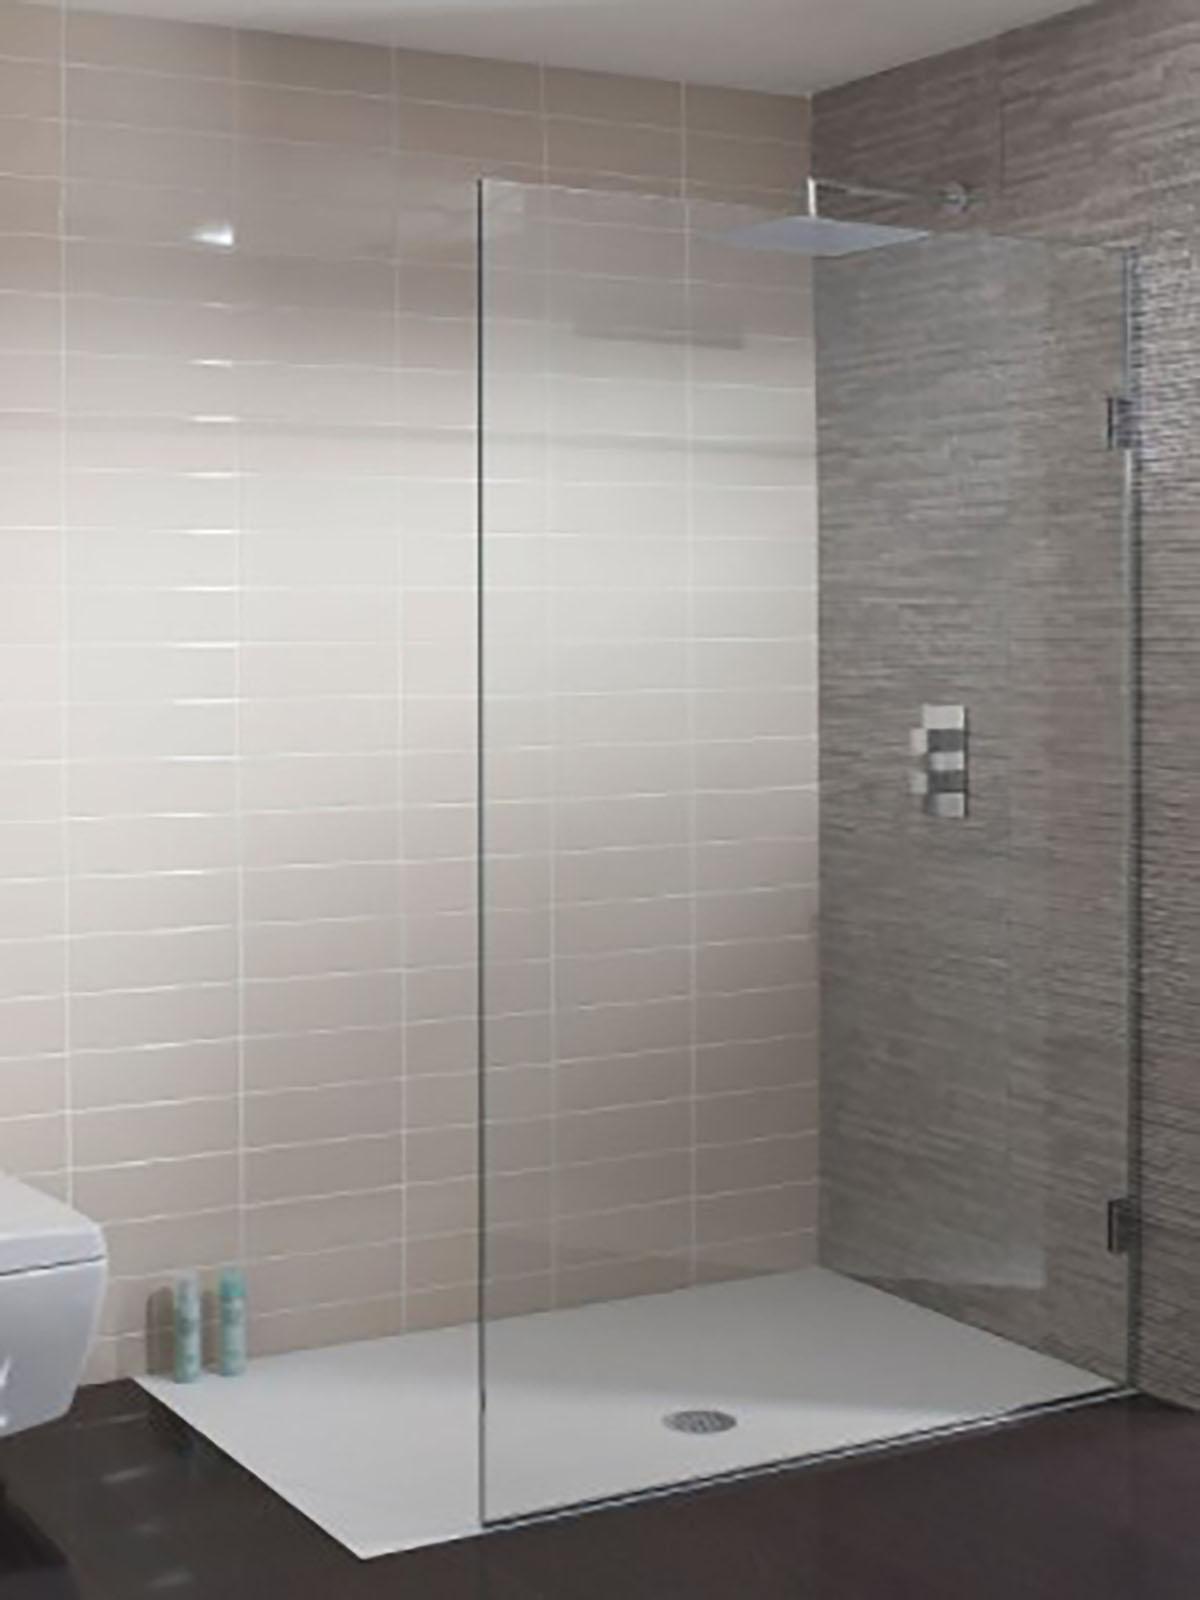 panel shower door 2_photoshopped